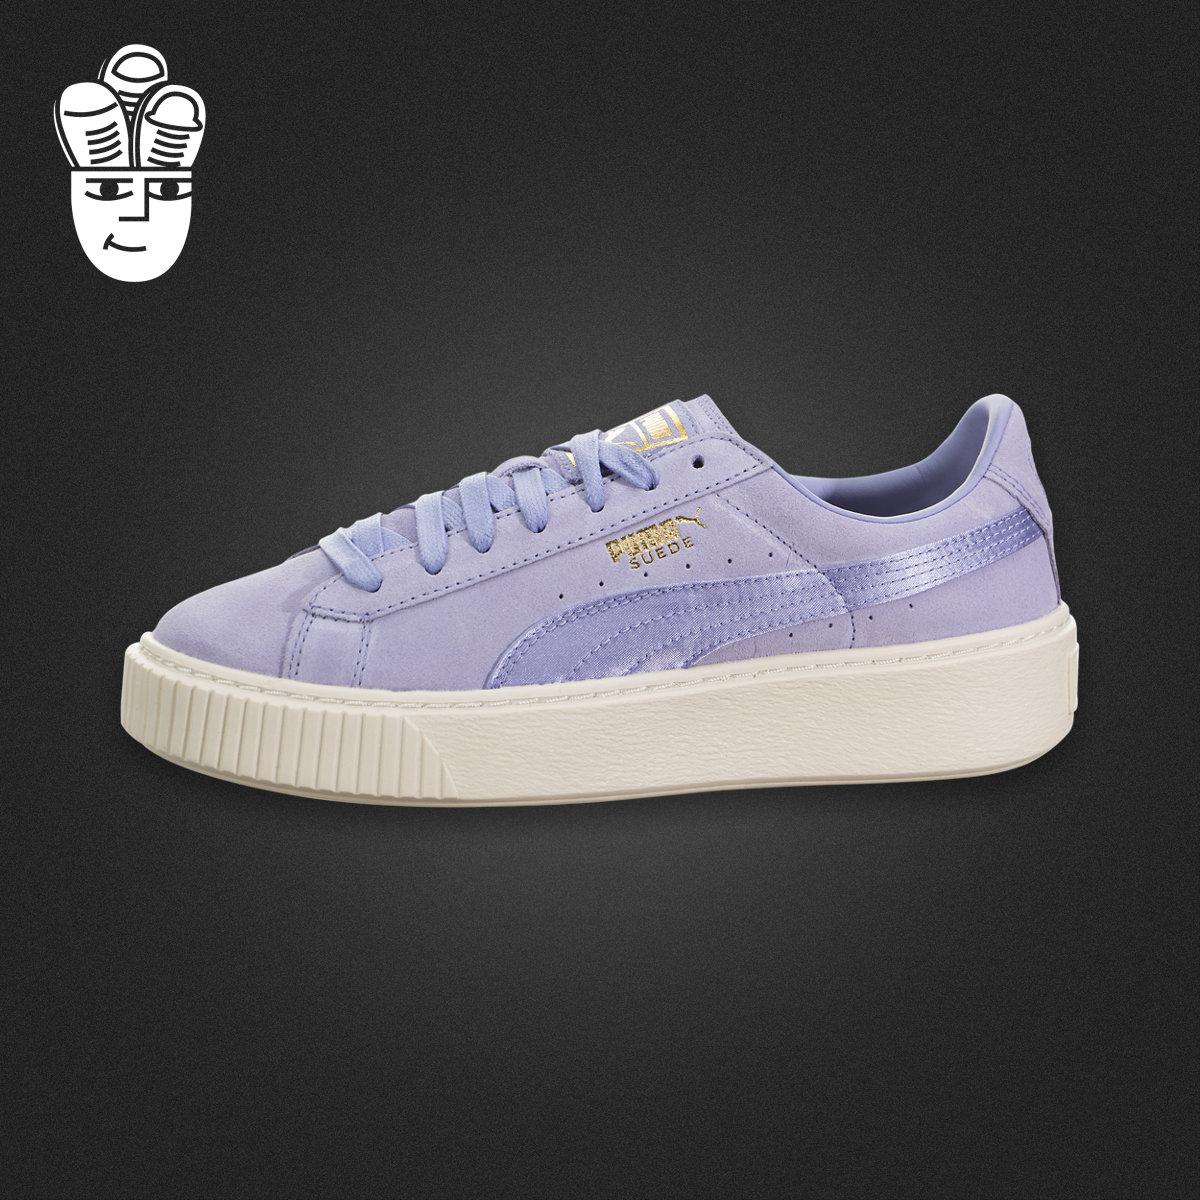 Puma Suede Platform 彪馬女鞋 厚底松糕鞋 休閑鞋 蕾哈娜同款